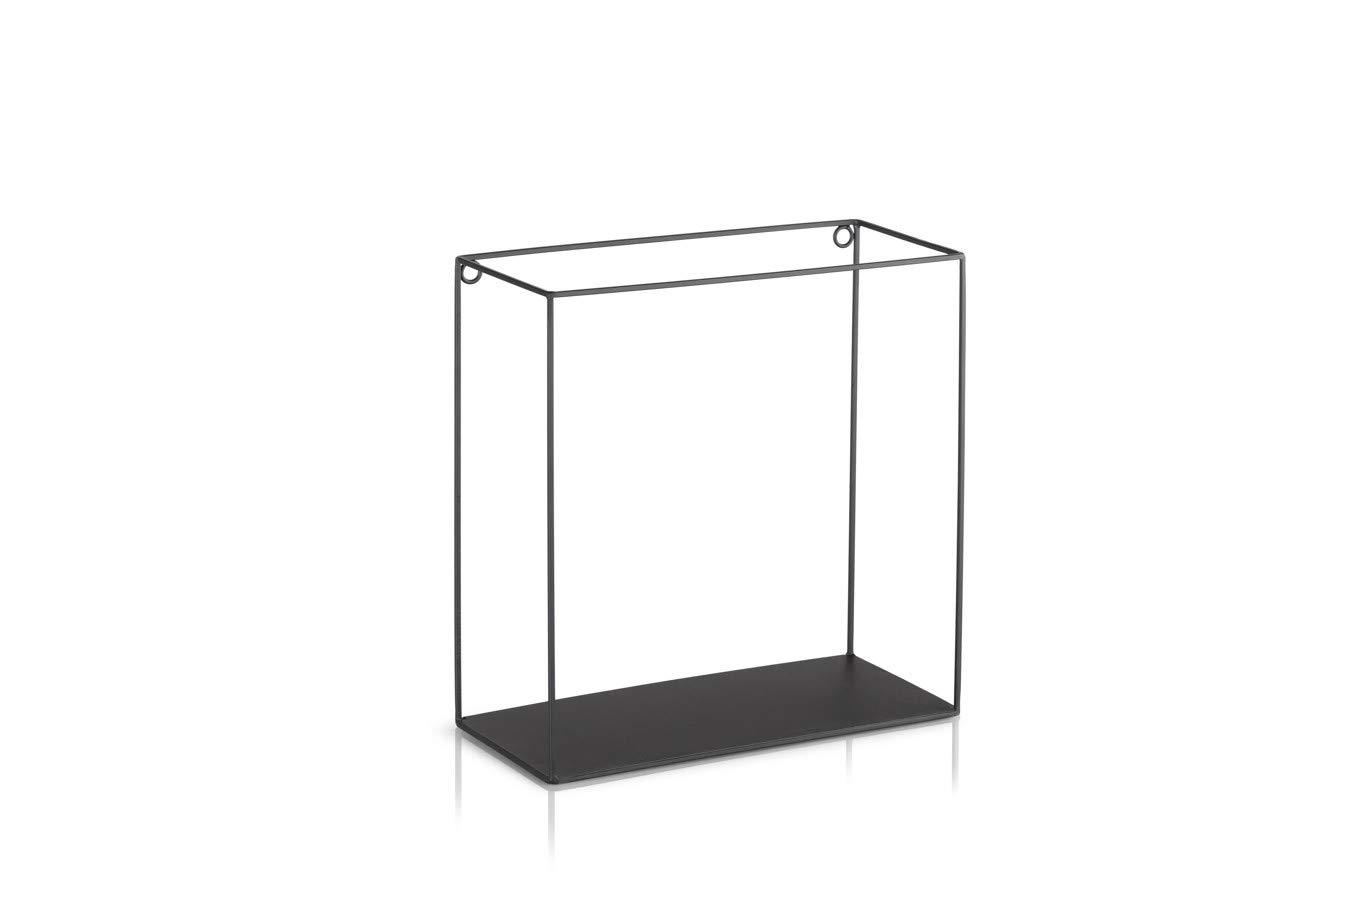 Schweberegal schwarz Metall Elegante Wanddeko Quadrat als B/ücherregale Belastbarkeit 3 kg K/üche LIFA LIVING 3er Set Wandregal im Industrie Design